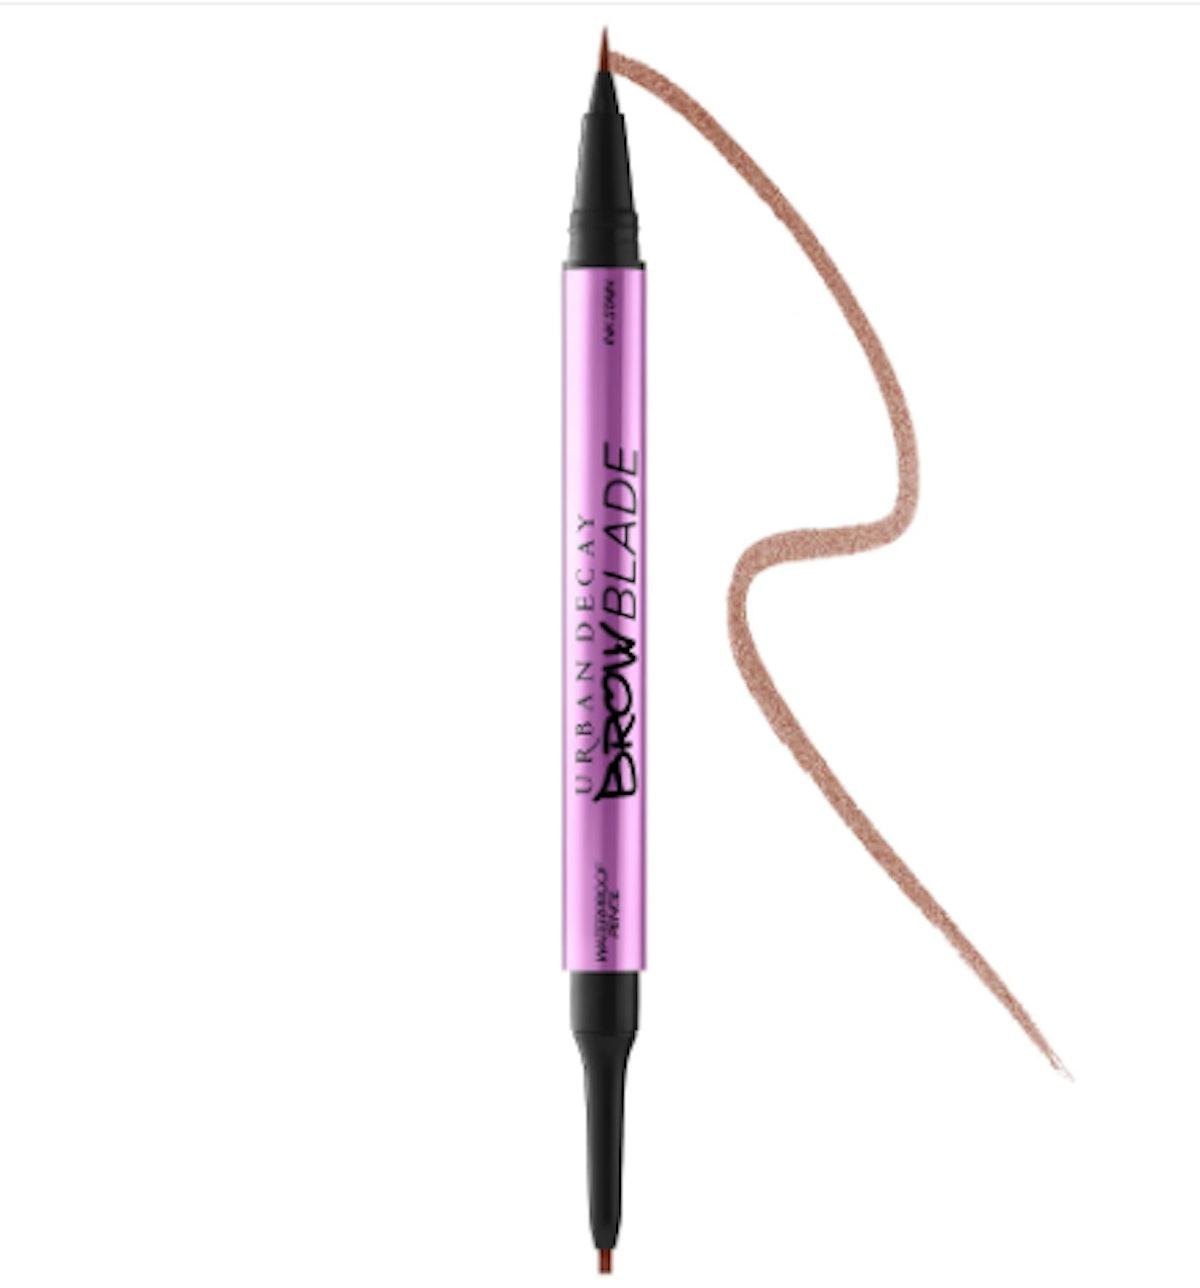 URBAN DECAY Brow Blade Waterproof Eyebrow Pencil & Ink Stain